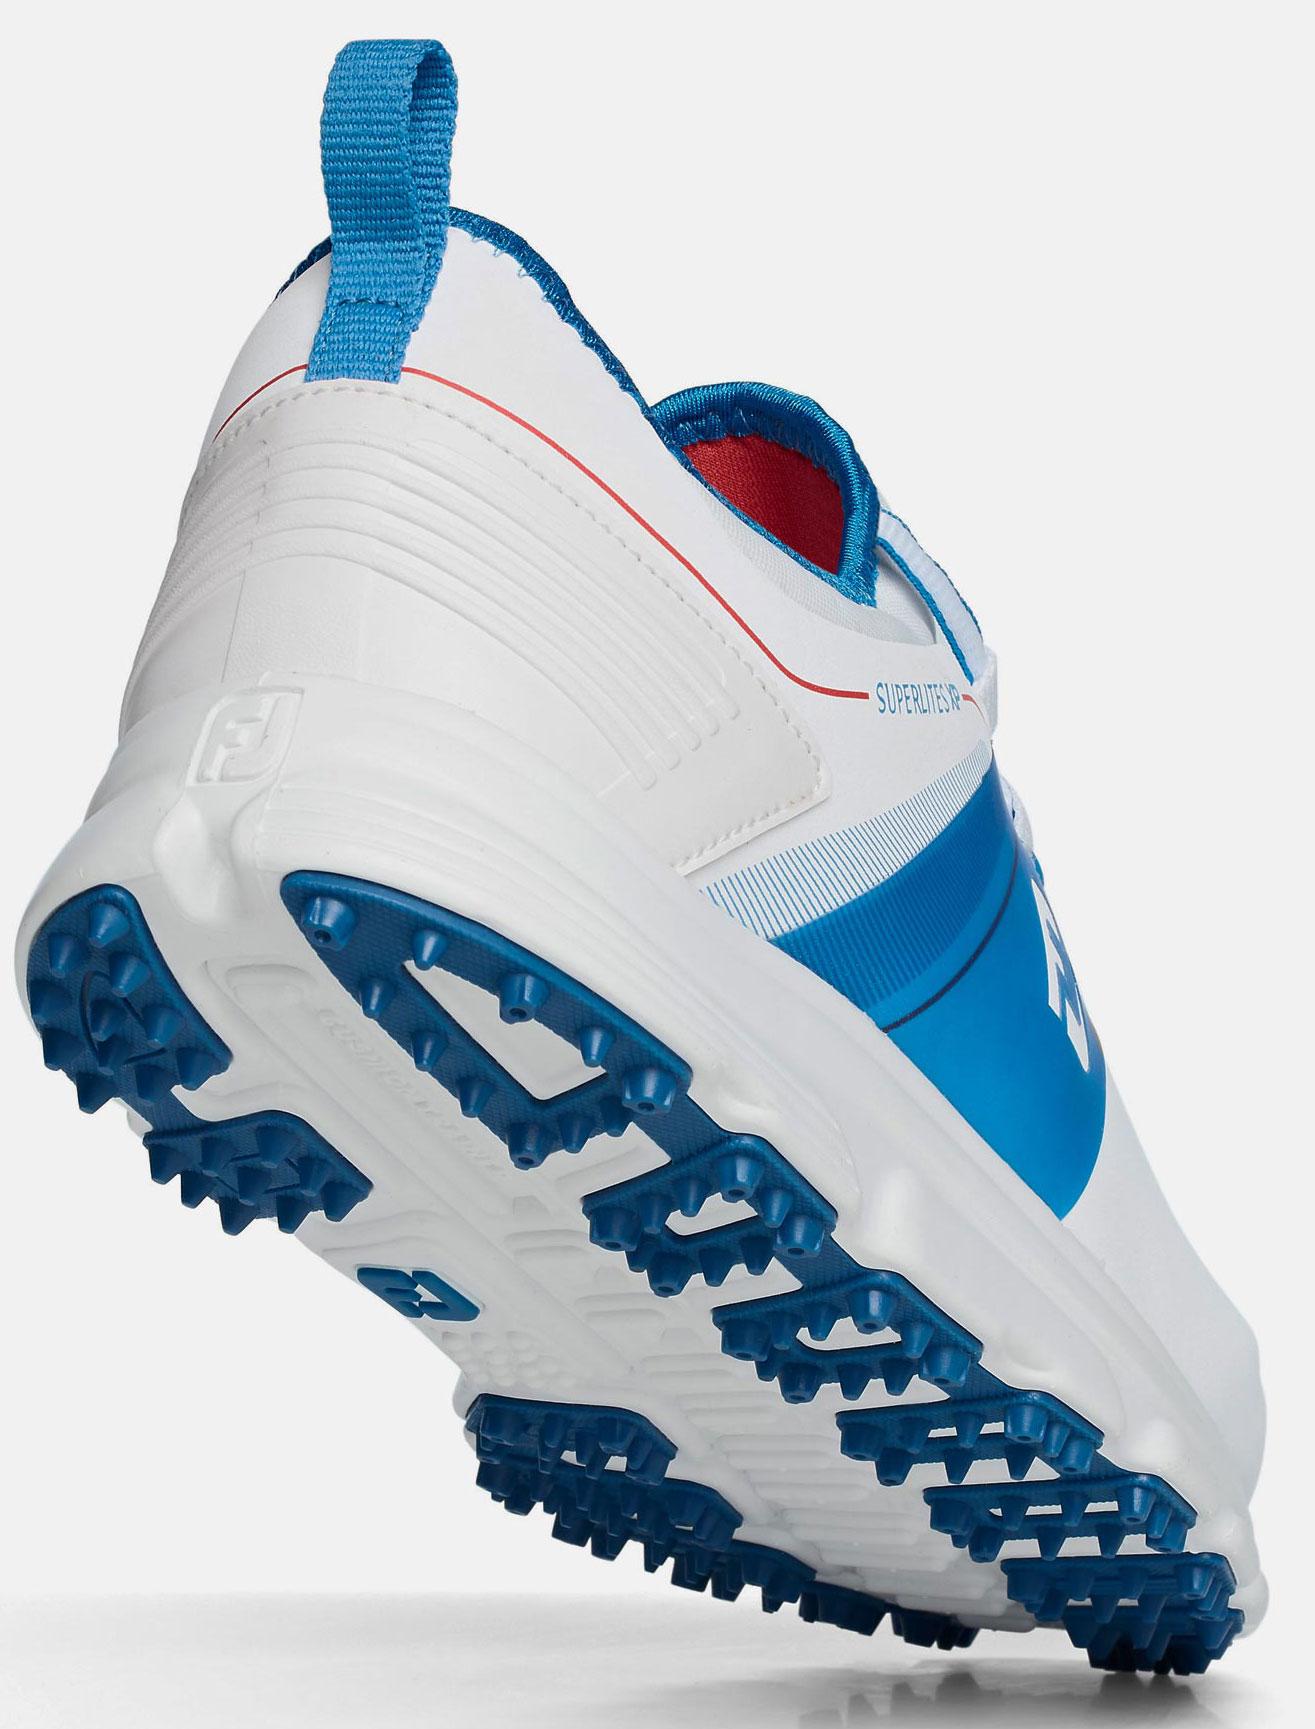 FootJoy-Superlites-XP-Golf-Shoes-Men-039-s-New thumbnail 11